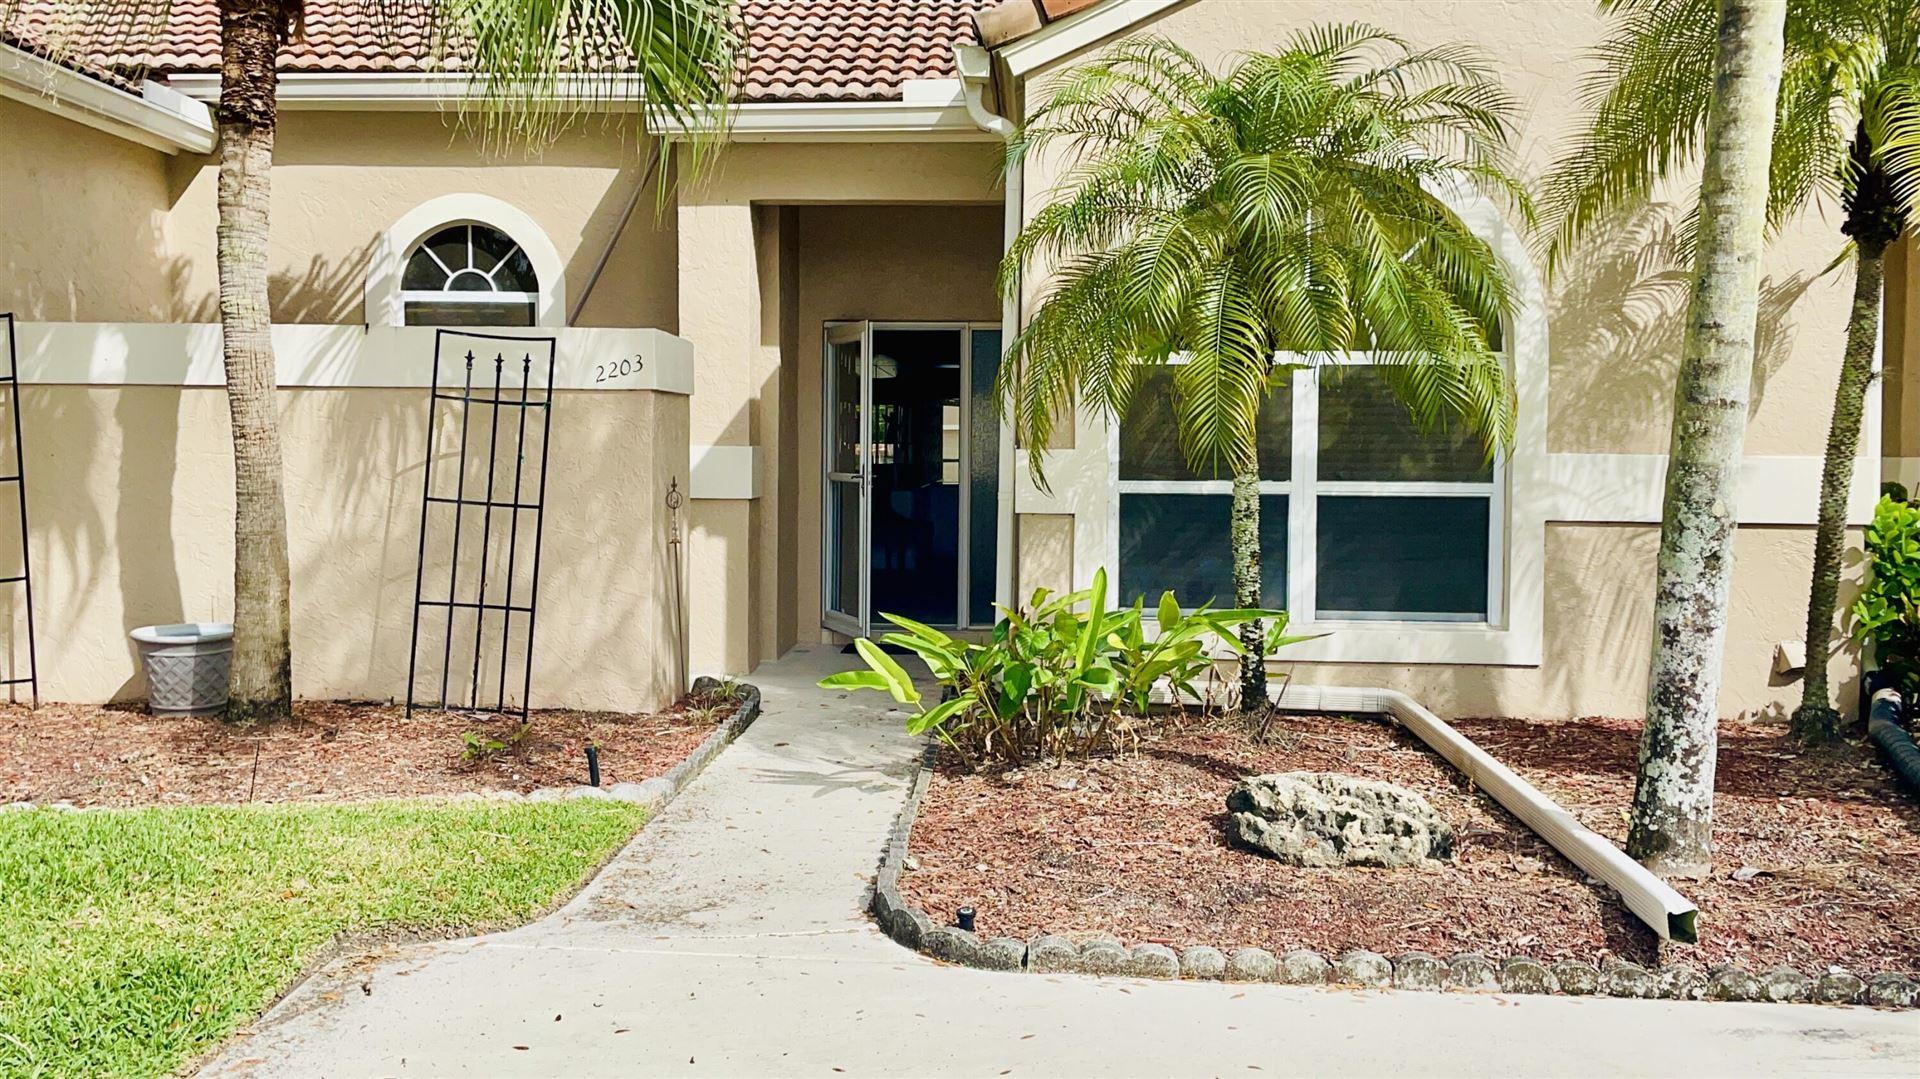 Photo of 2203 Heather Run Terrace, Palm Beach Gardens, FL 33418 (MLS # RX-10731722)